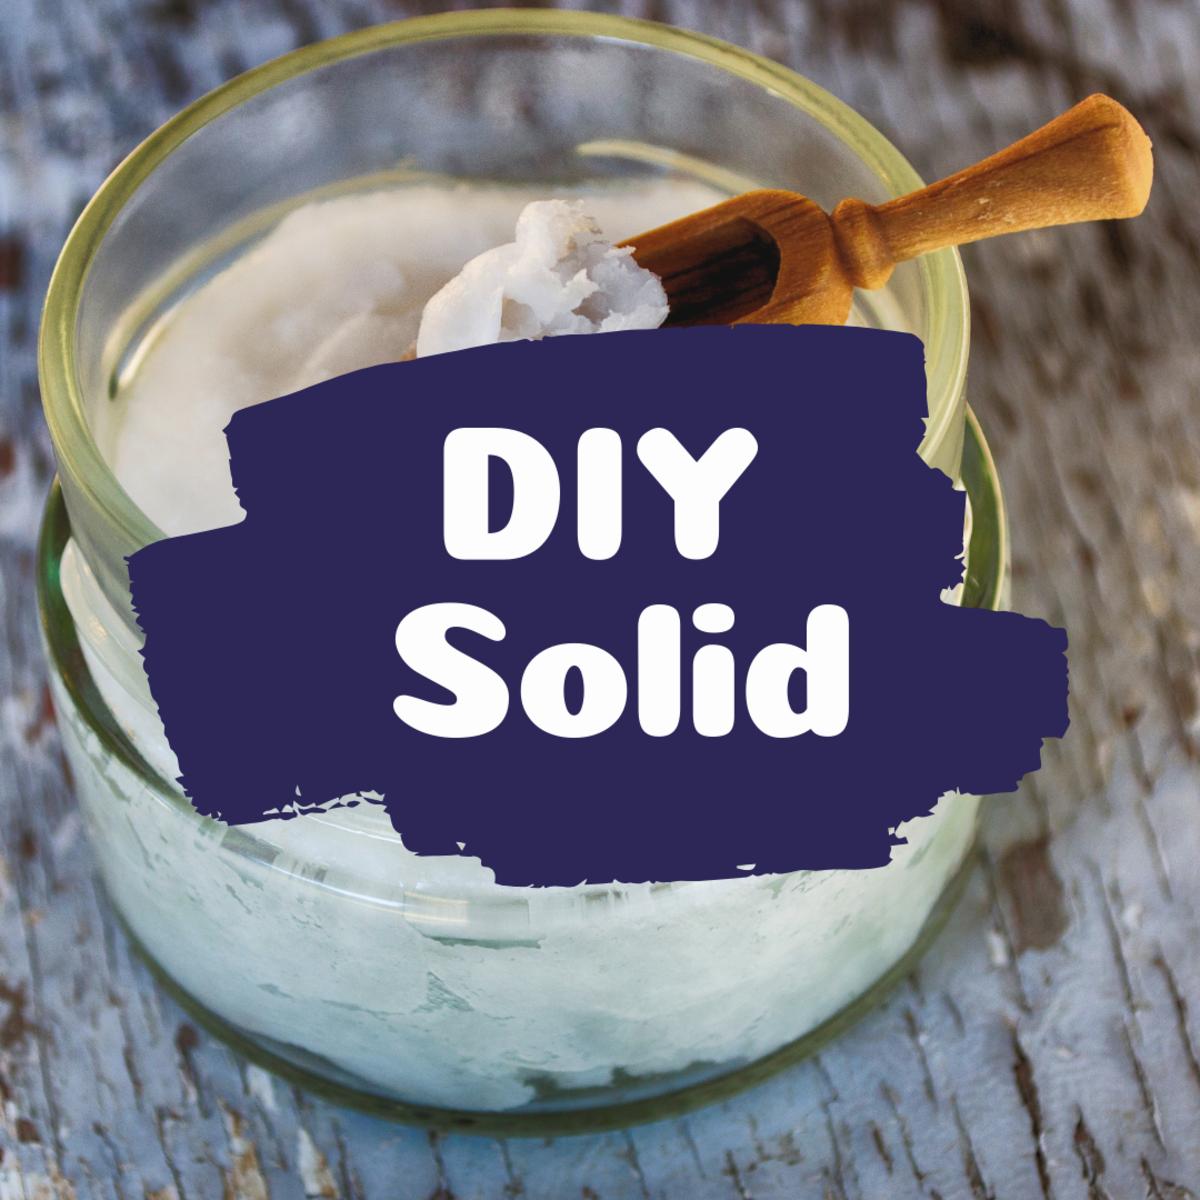 DIY solid deodorant and antiperspirant.